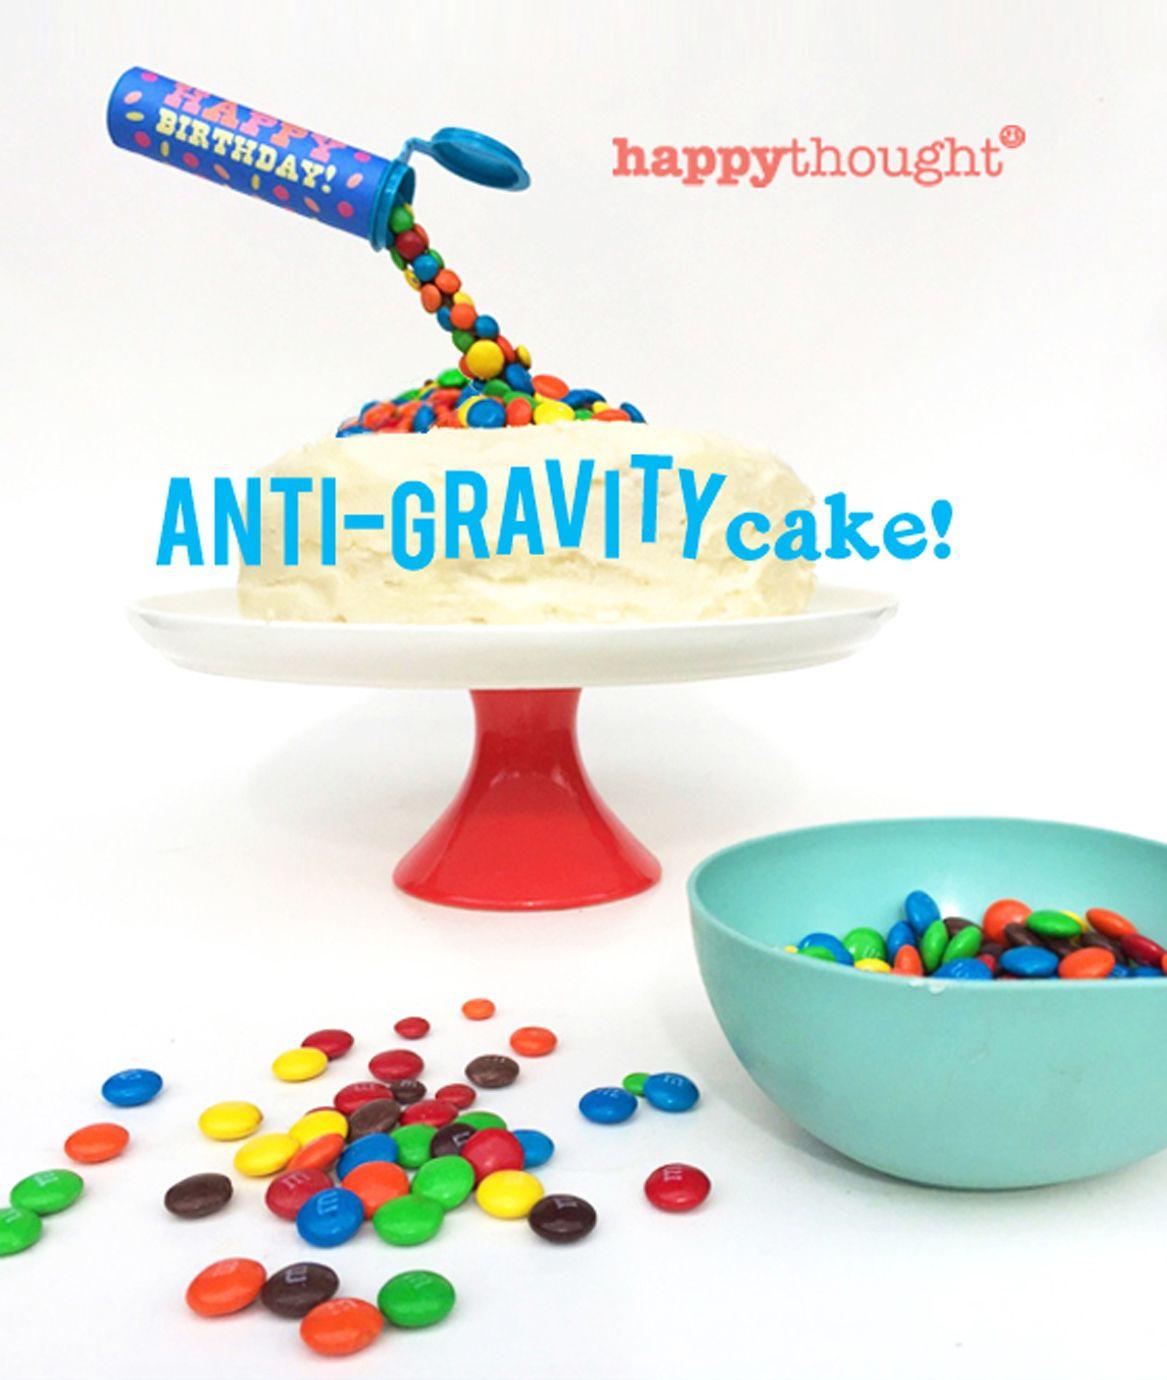 Easy and fun birthday cake ideas: Make an Anti-Gravity M&M cake! #birthdaycakes #bakingideas https://happythought.co.uk/craft/birthday-cake-ideas